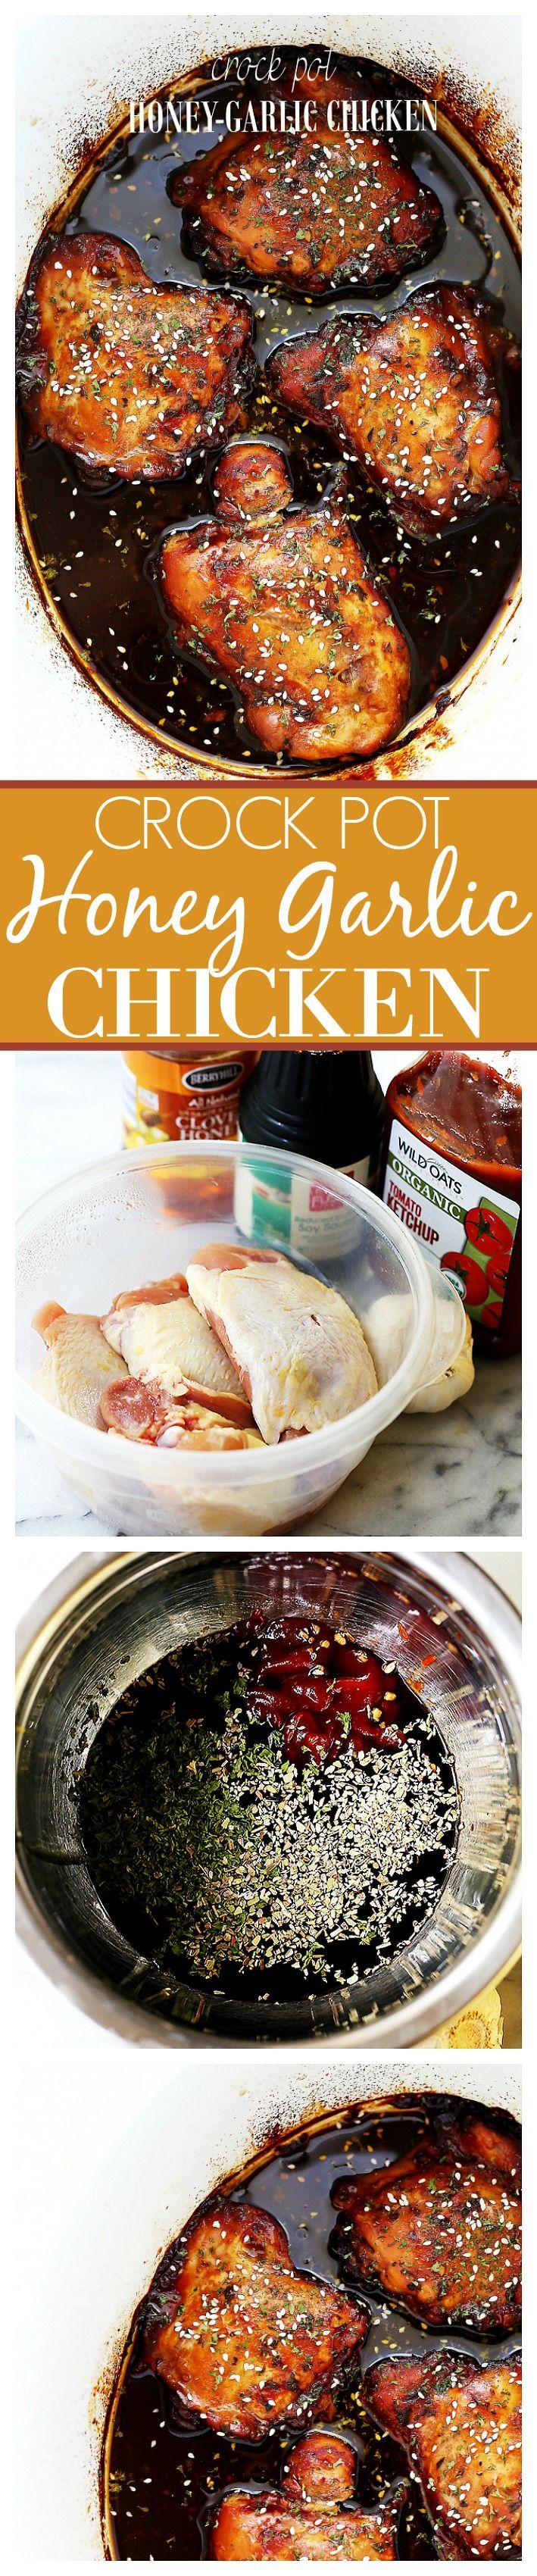 Crock Pot Honey-Garlic Chicken - Easy crock pot recipe for chicken thighs cooked in an incredibly delicious honey-garlic sauce.